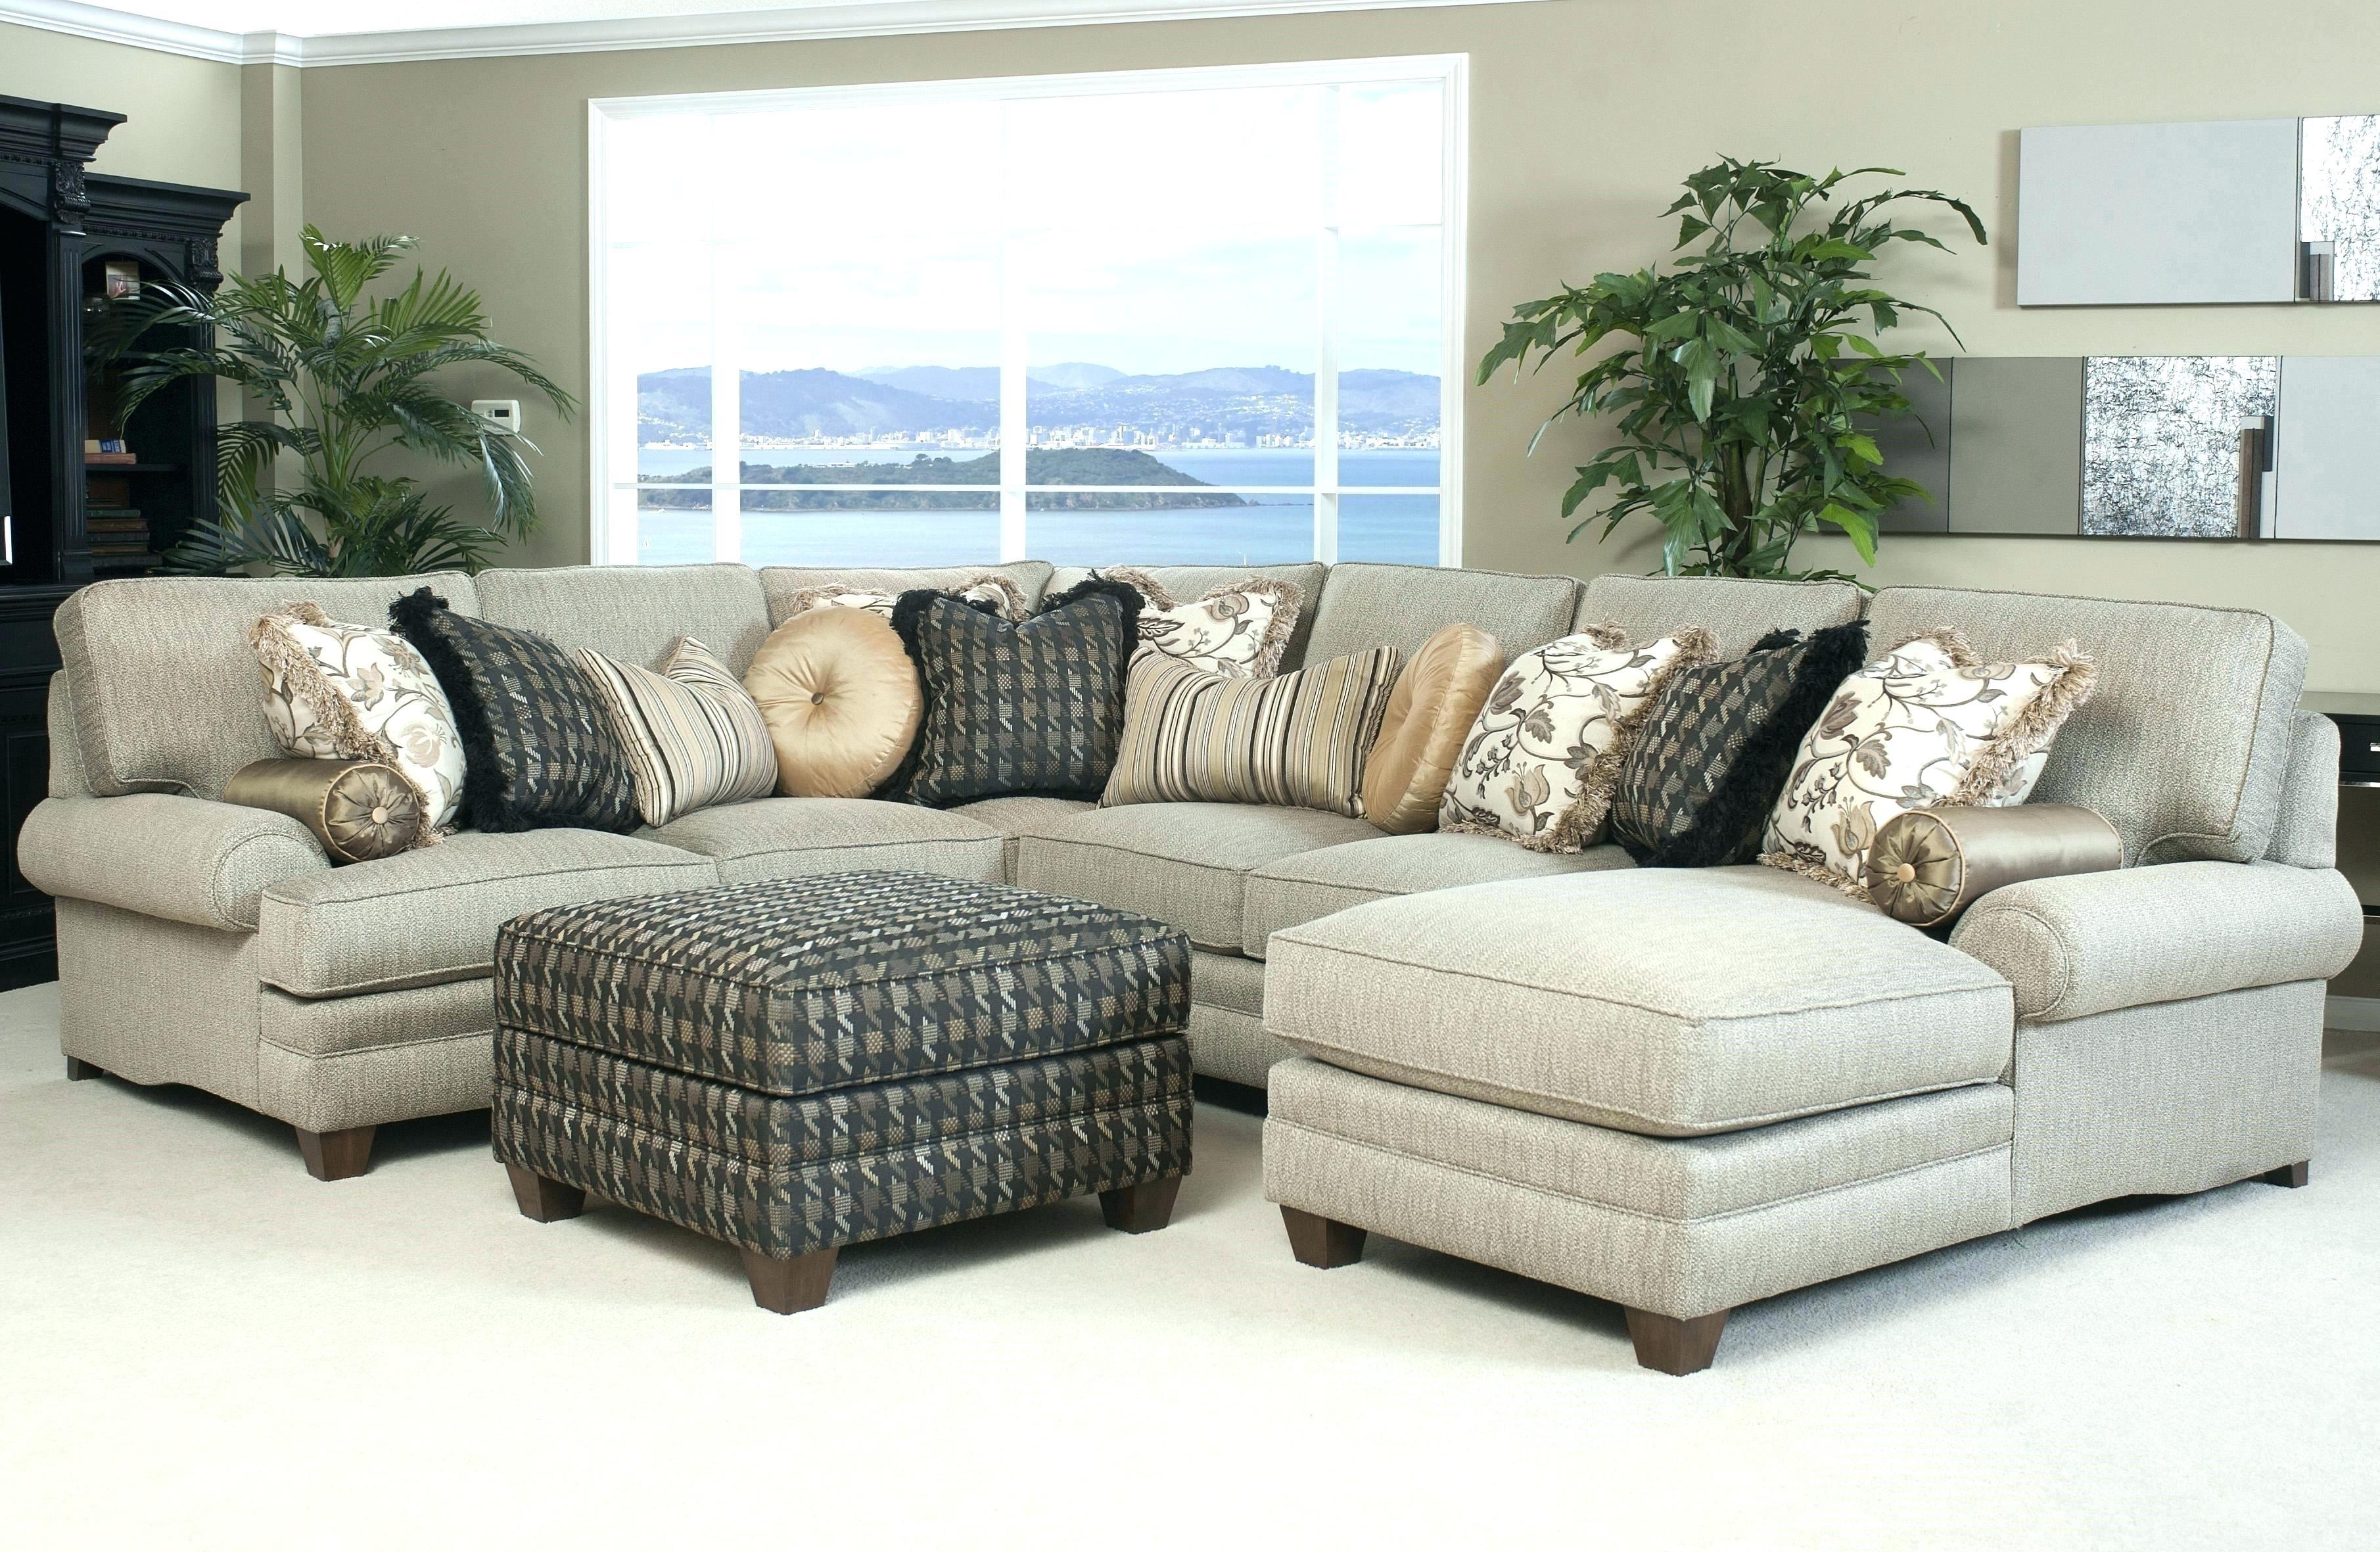 condo sized sectional sofa ottawa average height of back 10 ideas sale sofas